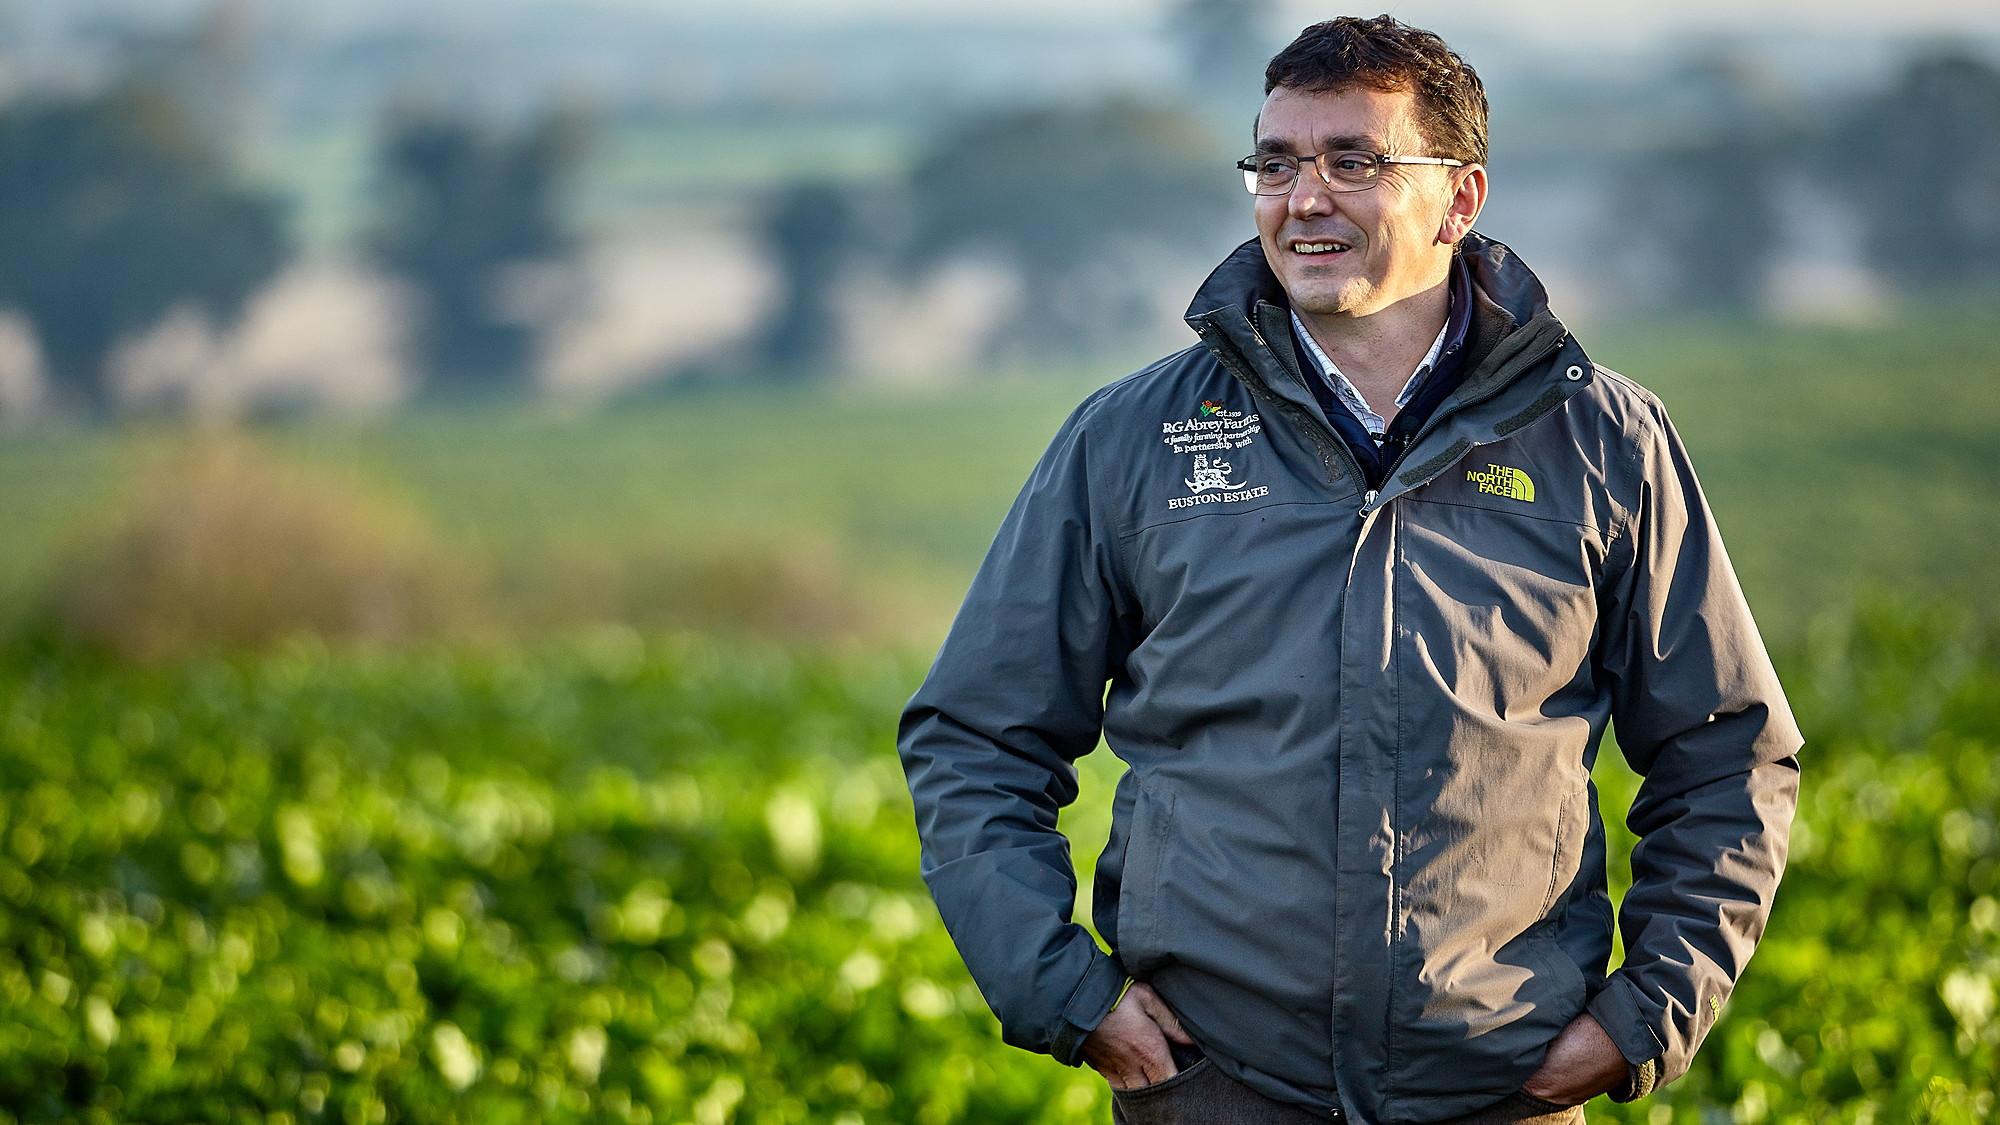 Matthew Hawthorne manages Euston Estate's farming operations